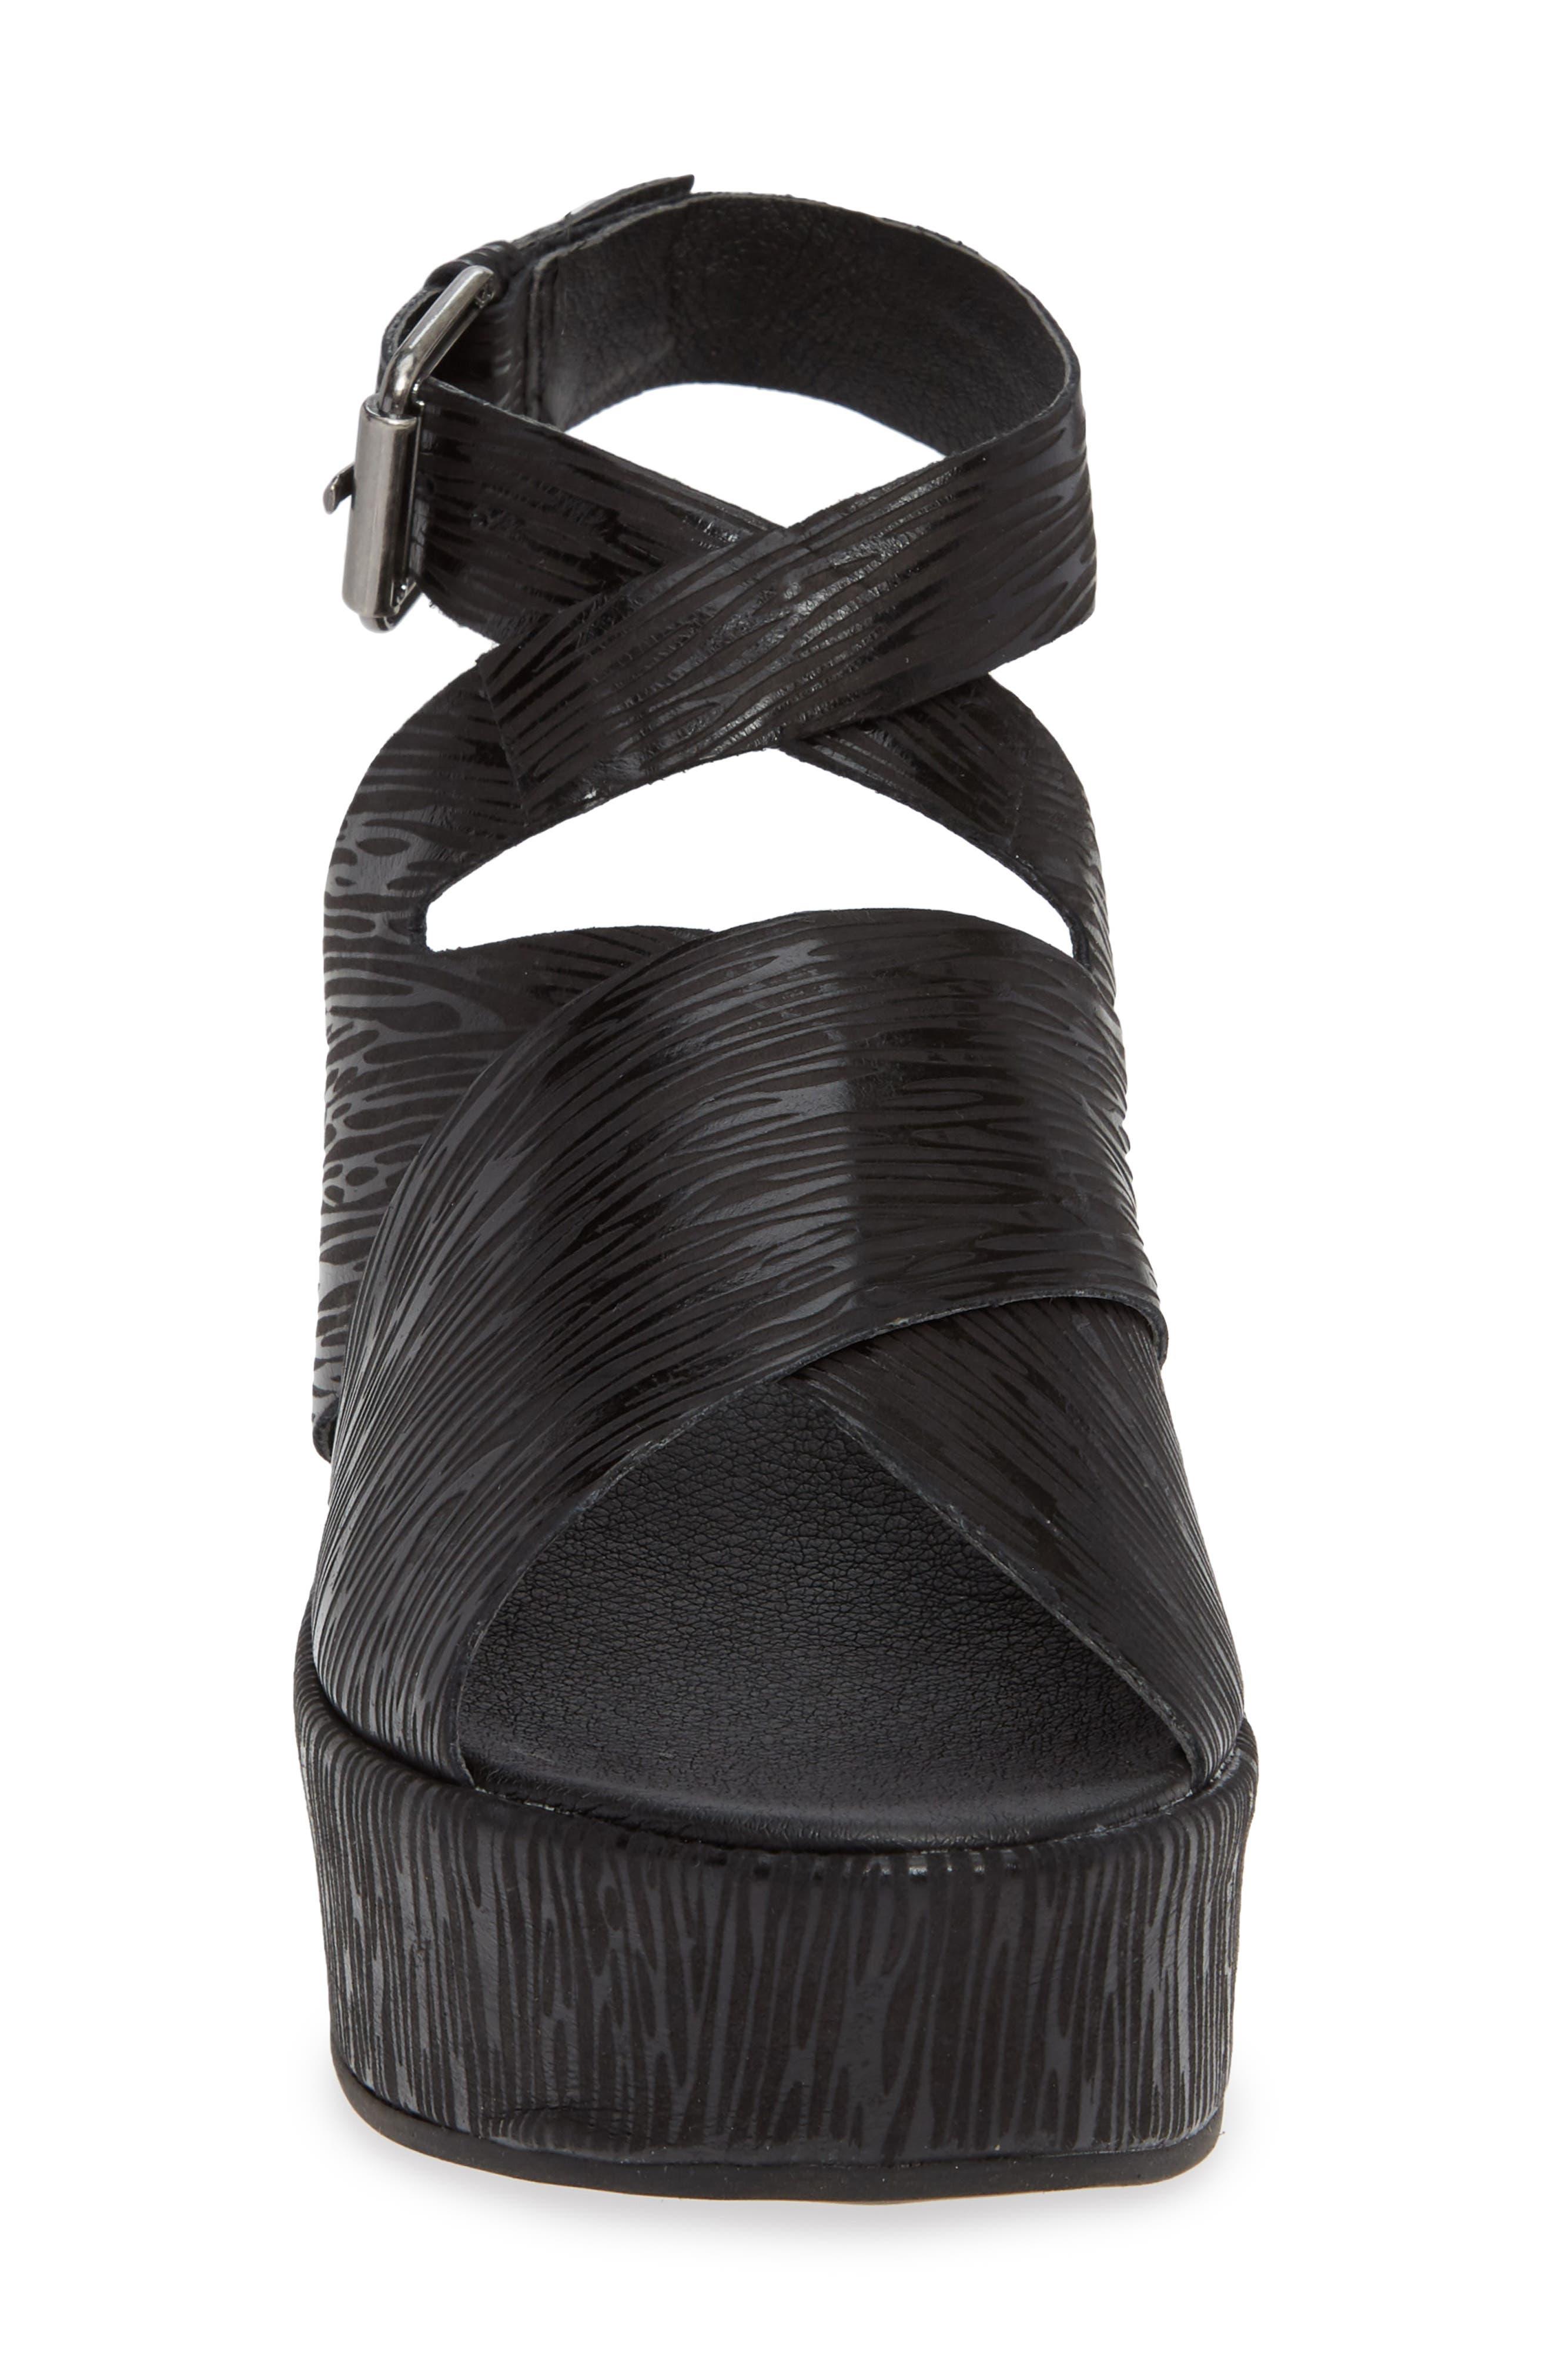 Runway Wedge Sandal,                             Alternate thumbnail 3, color,                             Black Lizard Print Leather